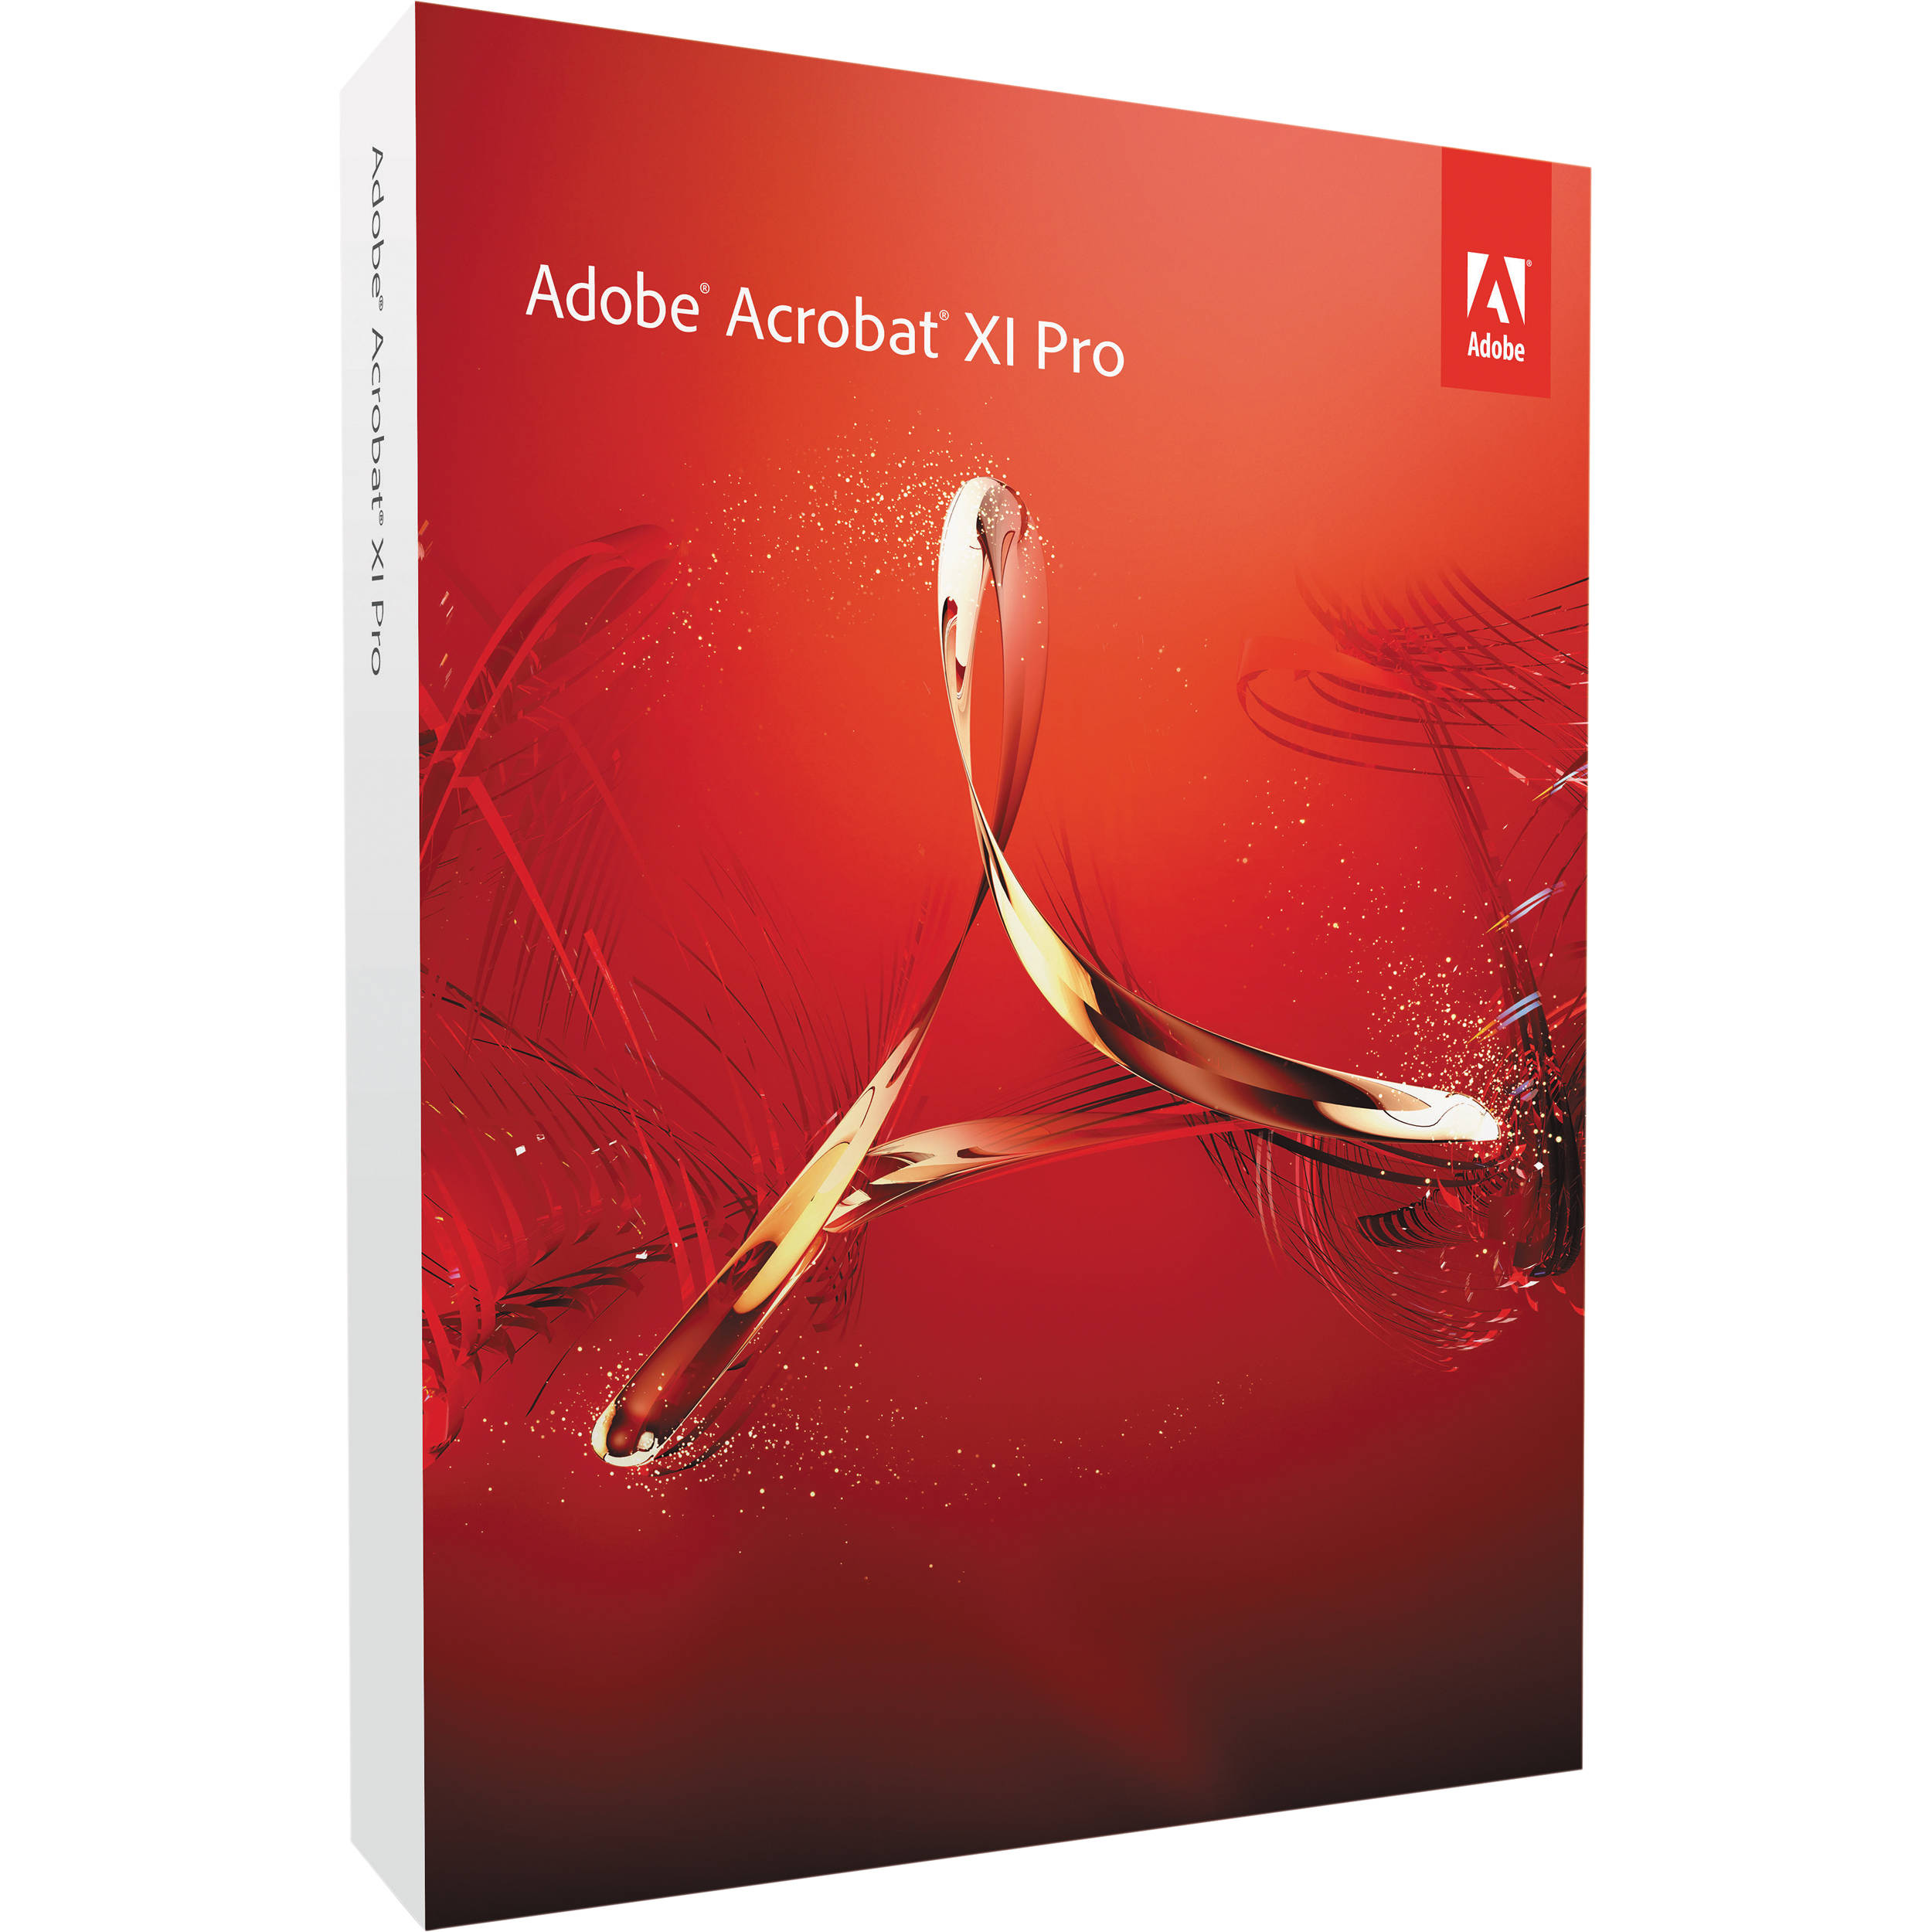 Adobe acrobat 9 professional download